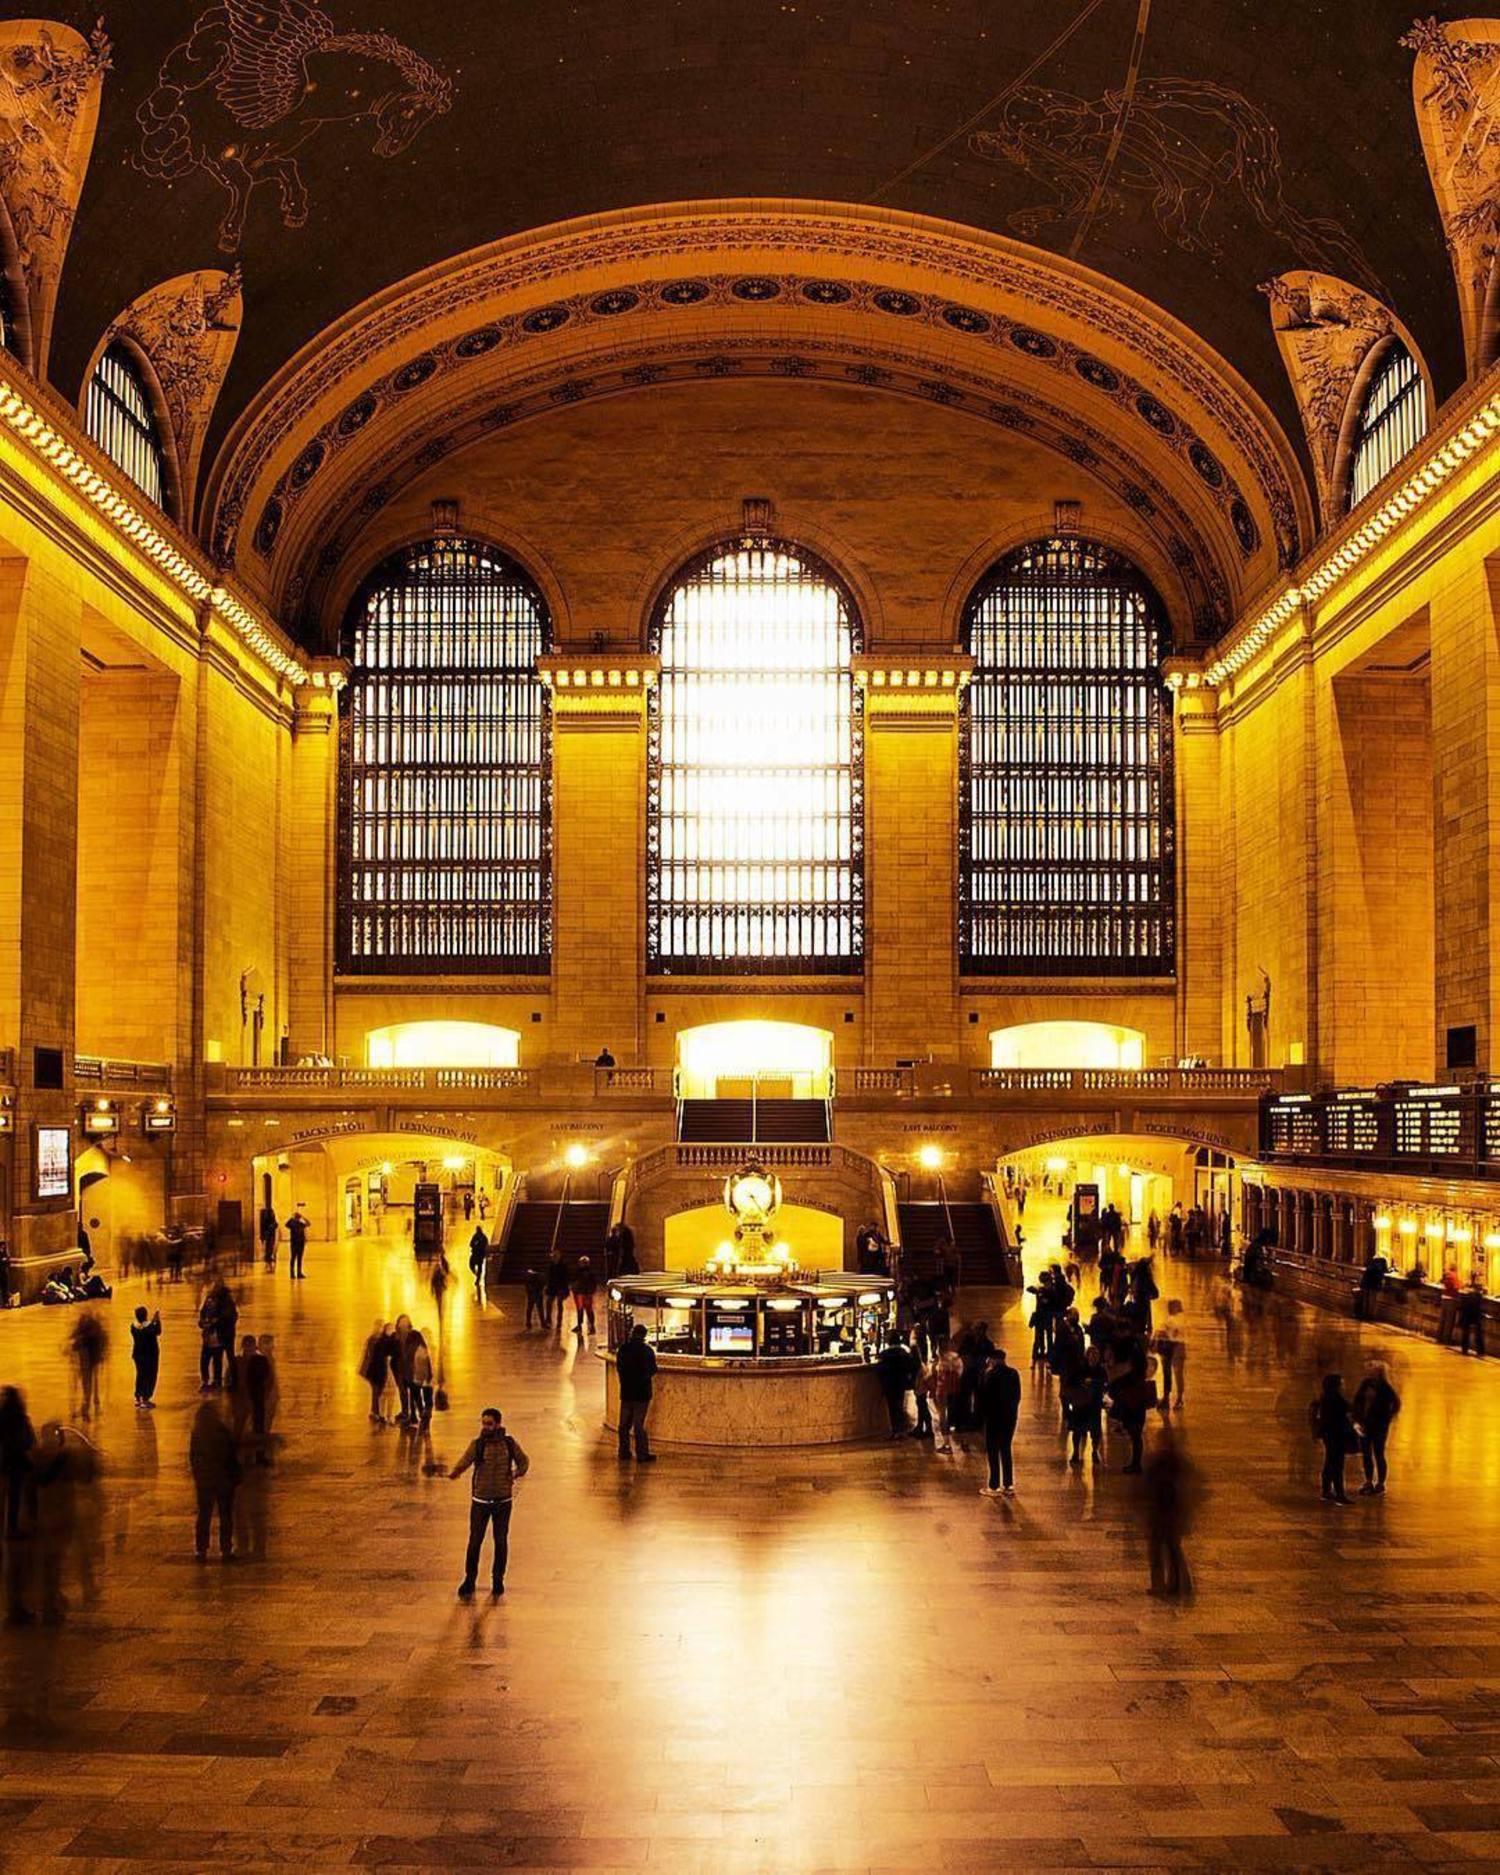 Grand Central Terminal. Photo via @photos_by_ricardo #viewingnyc #nyc #newyork #newyorkcity #grandcentral #grandcentralterminal